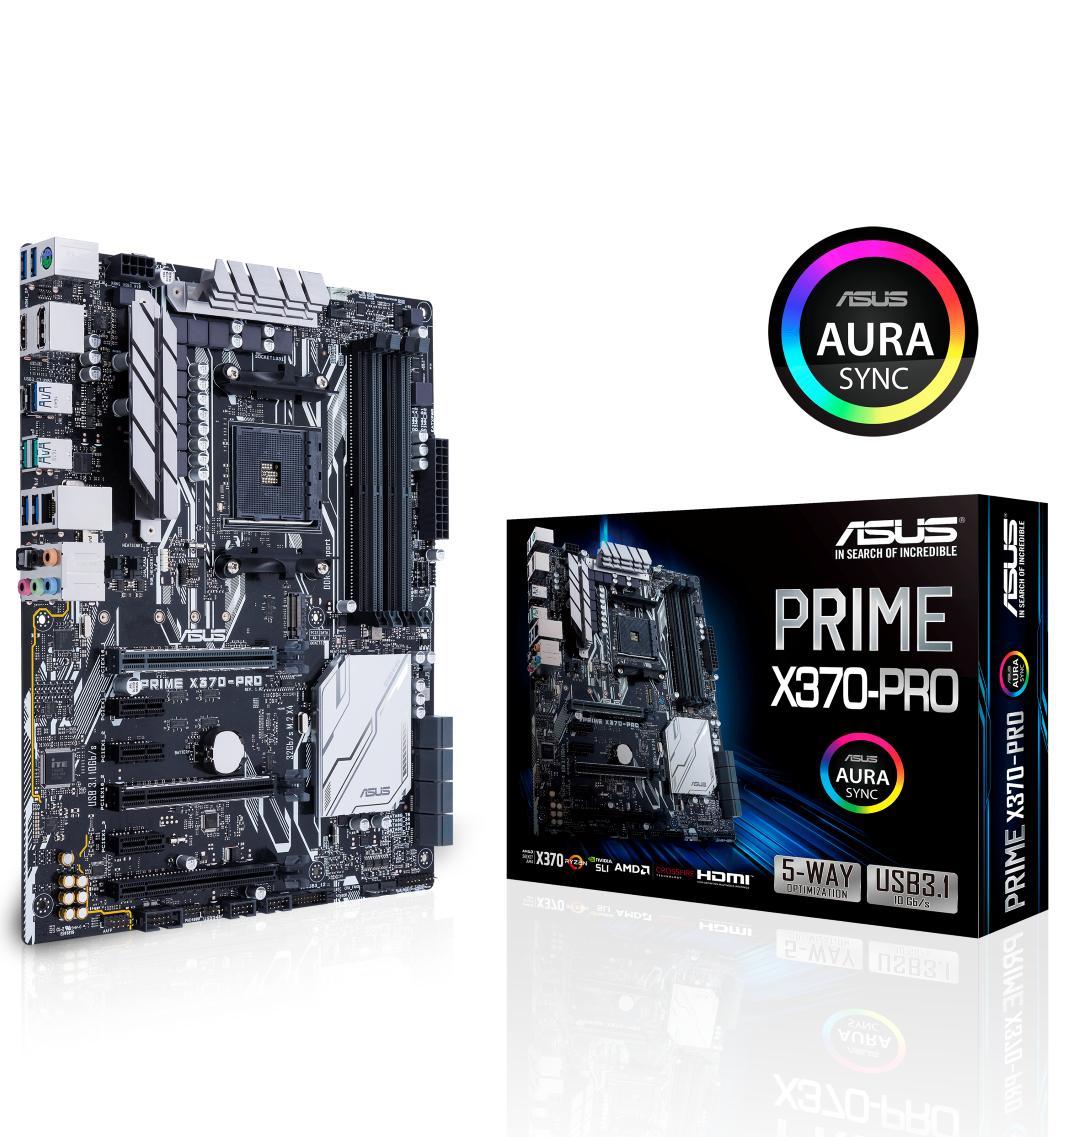 Asus PRIME X370-PRO ATX AM4